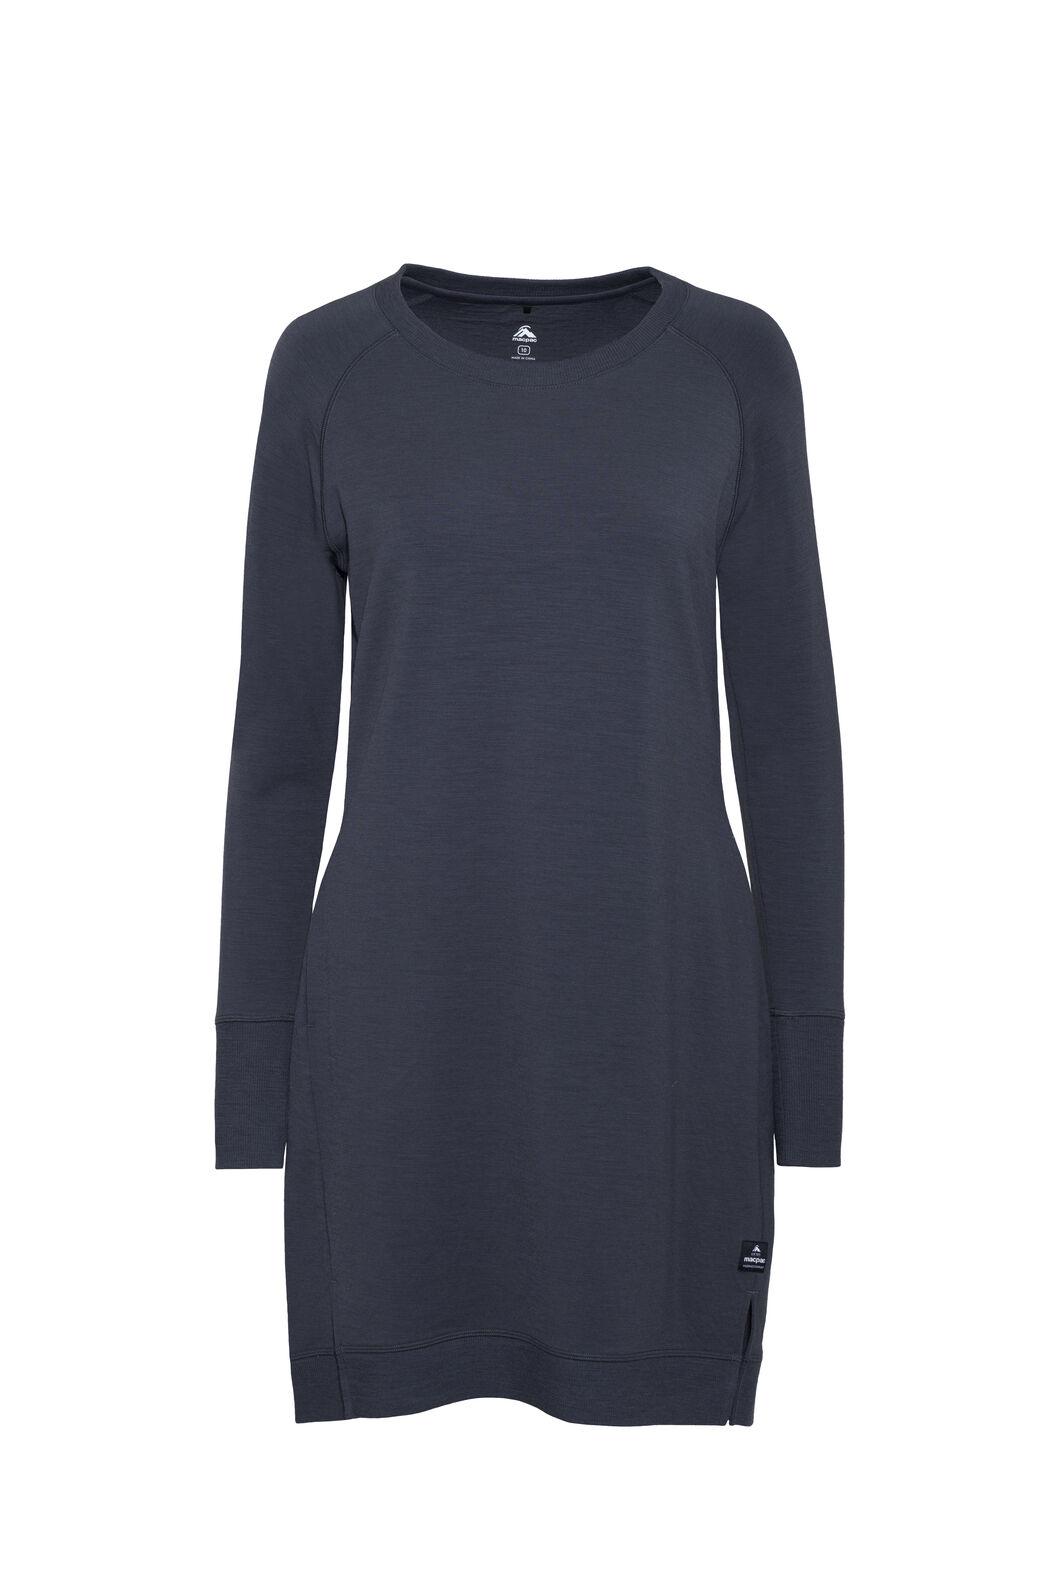 Macpac Platform Merino Dress — Women's, India Ink, hi-res